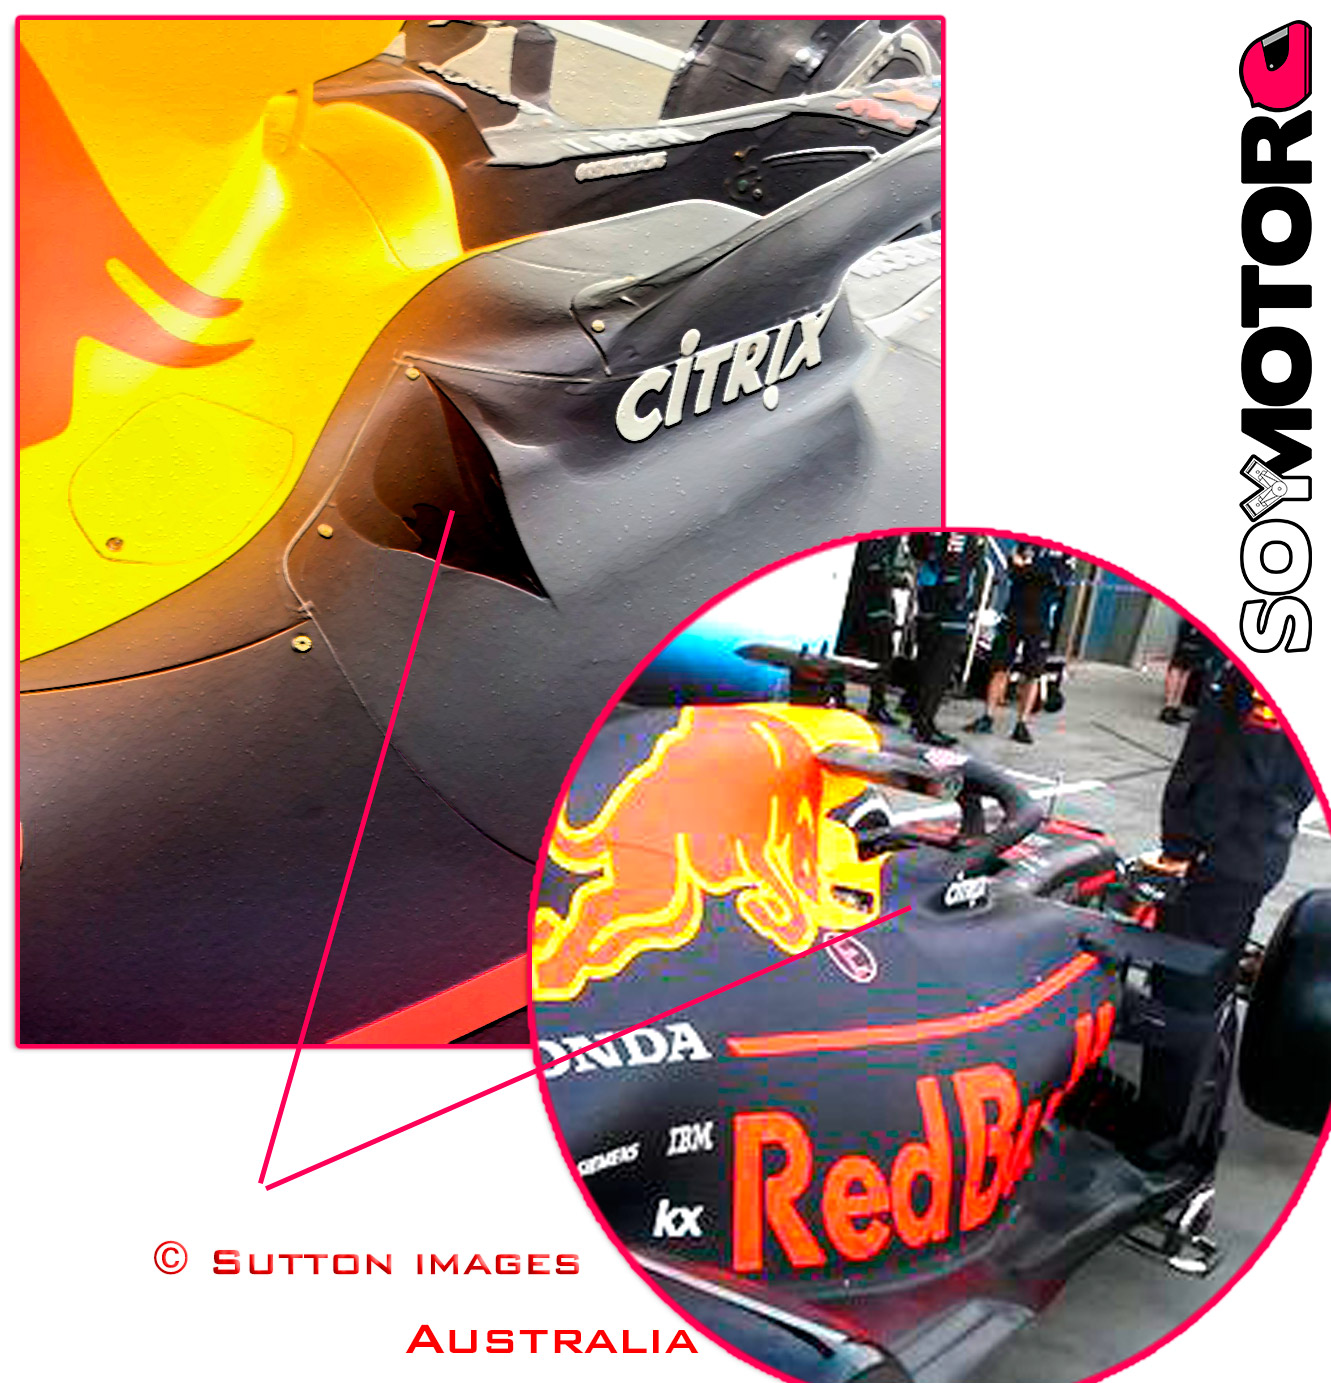 red-bull-salida-refrigeracion-cockpit.jpg